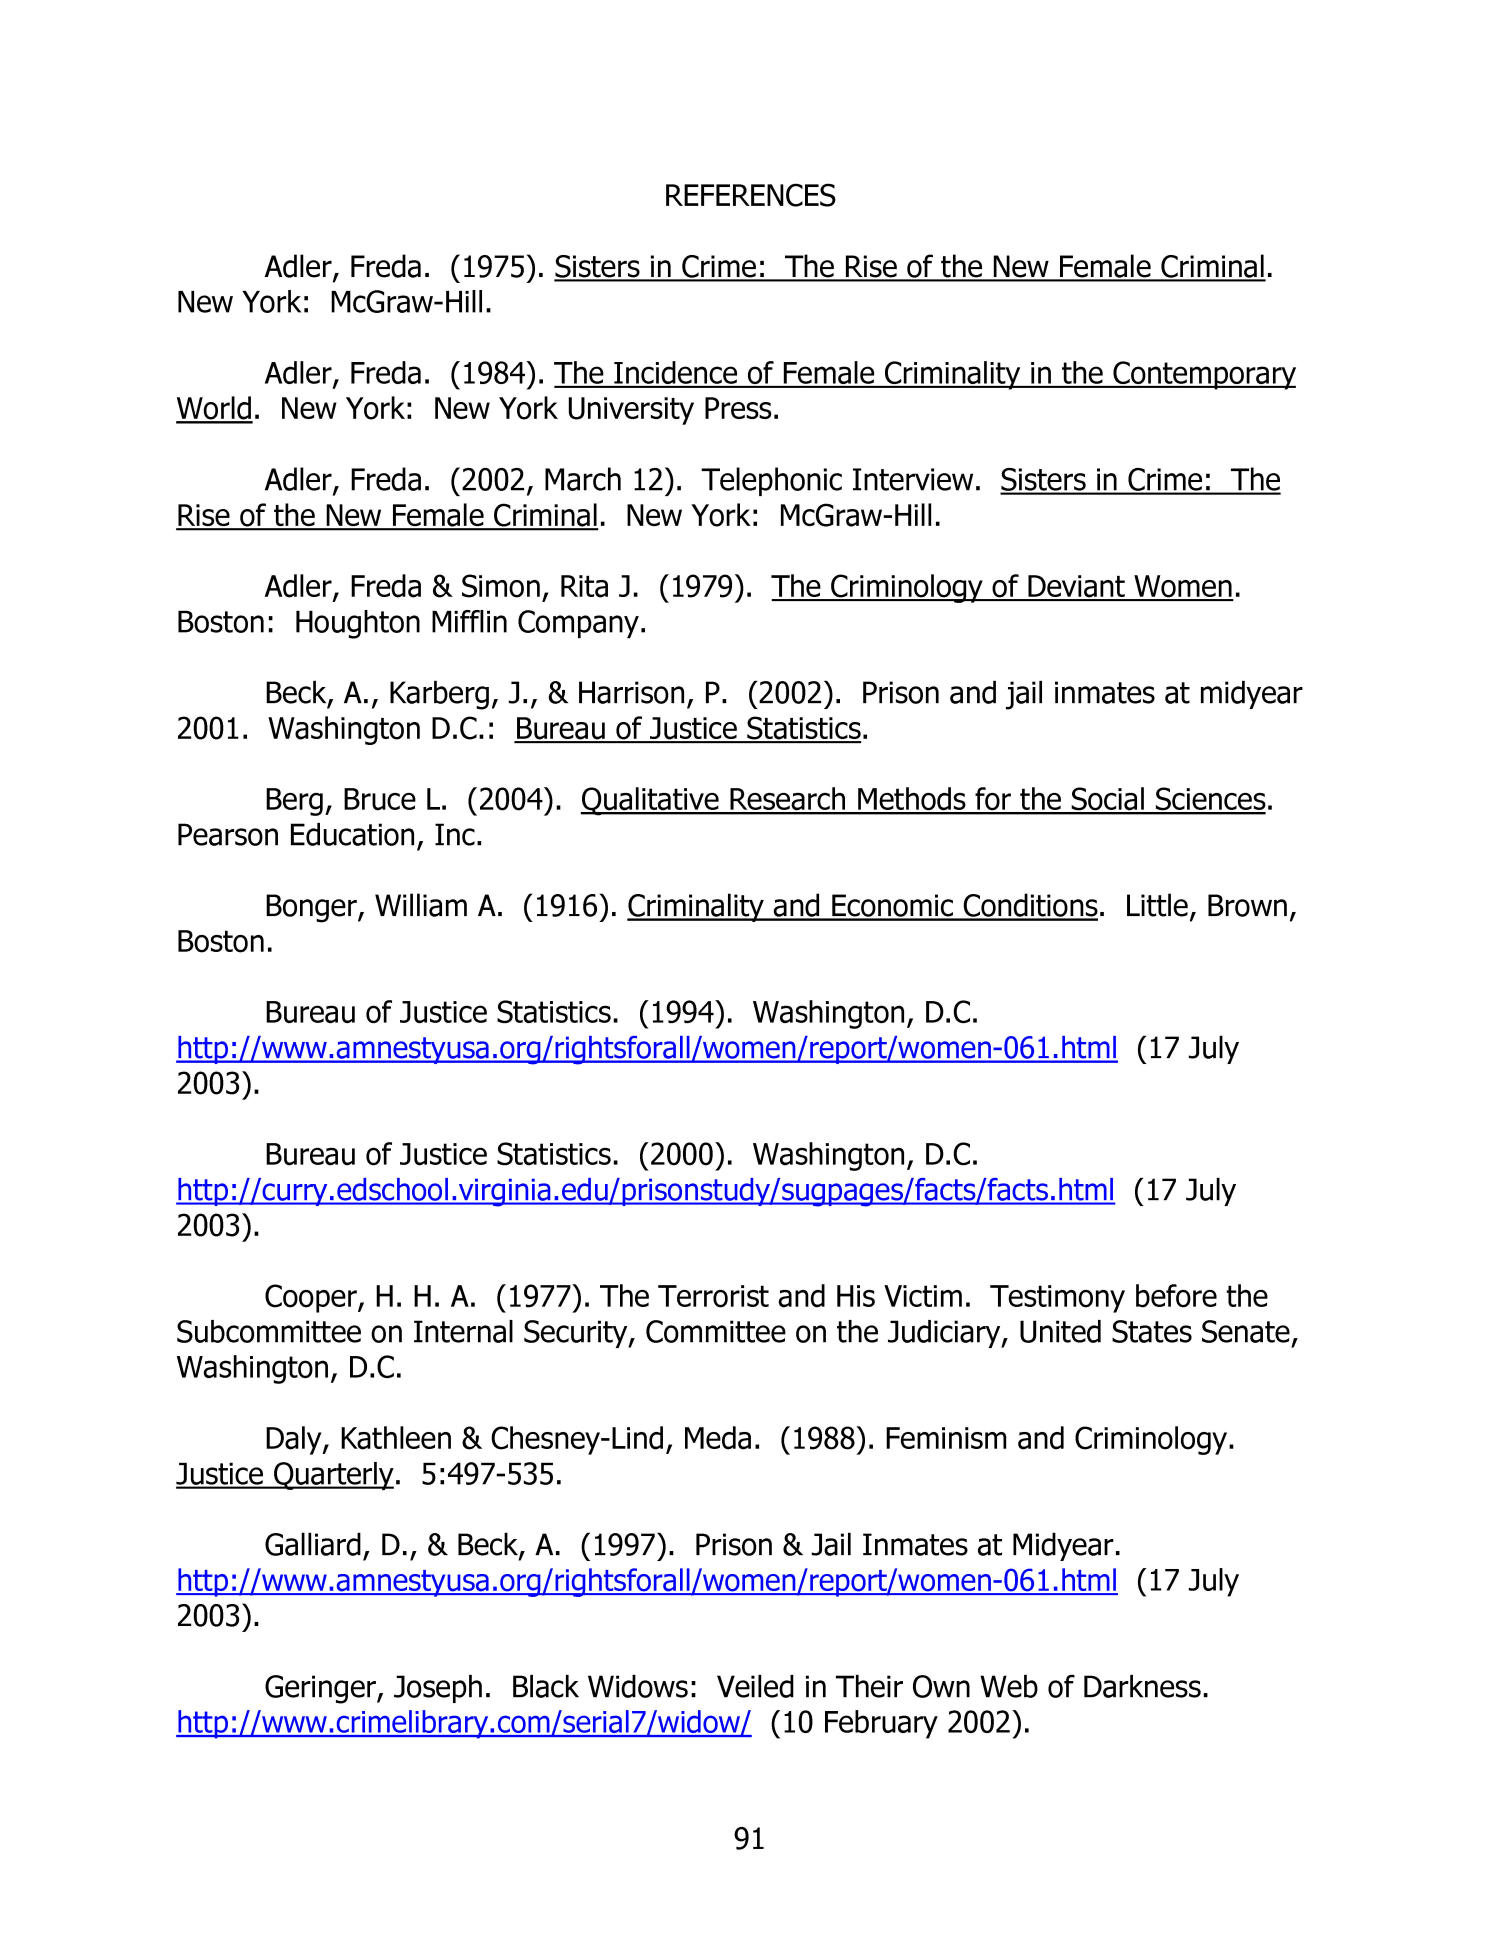 Aqa religious studies gcse past papers 2011